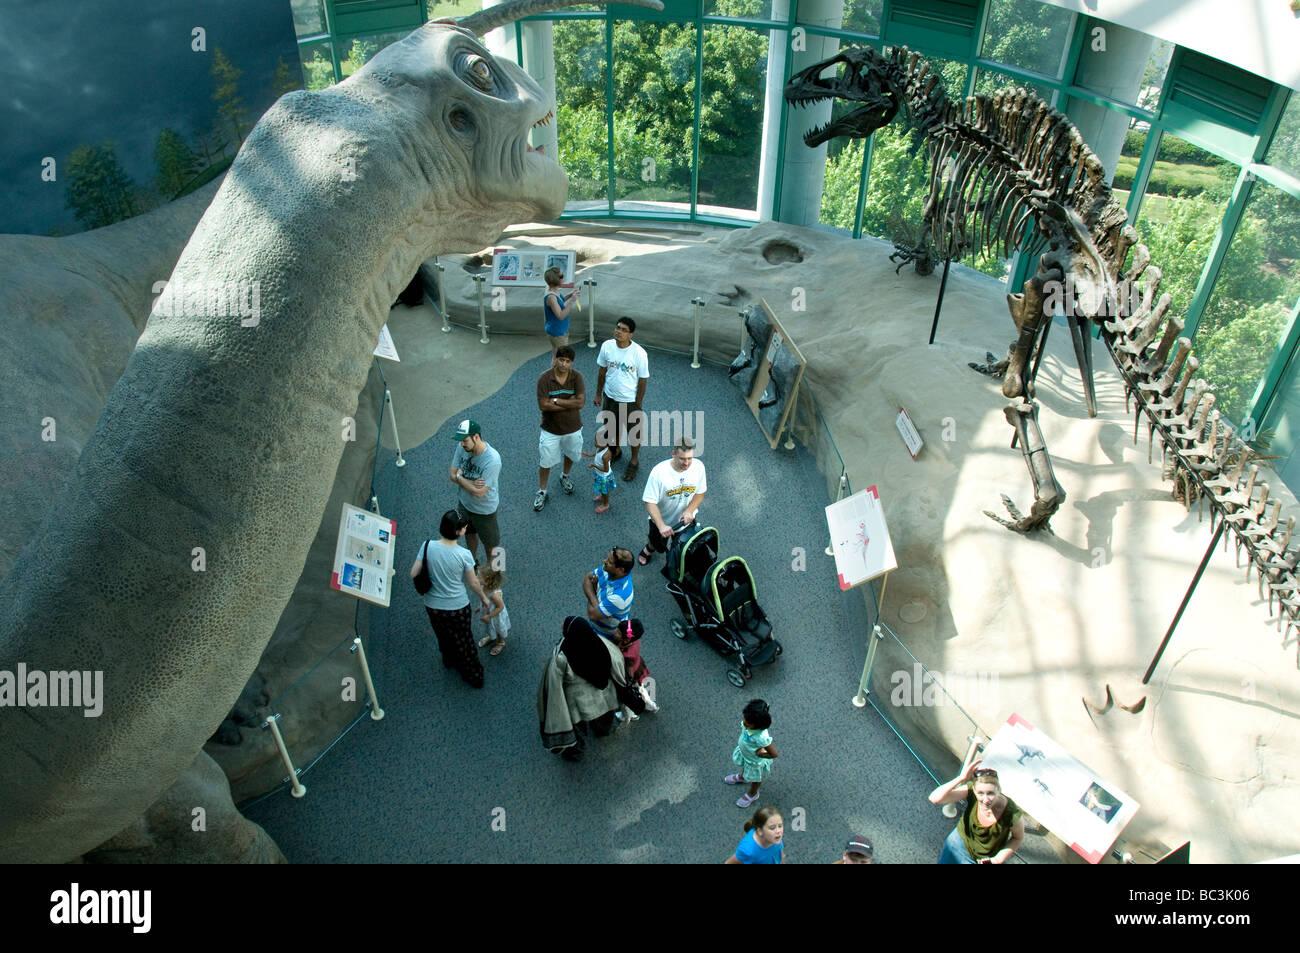 North Carolina Museum of Natural Sciences. - Stock Image